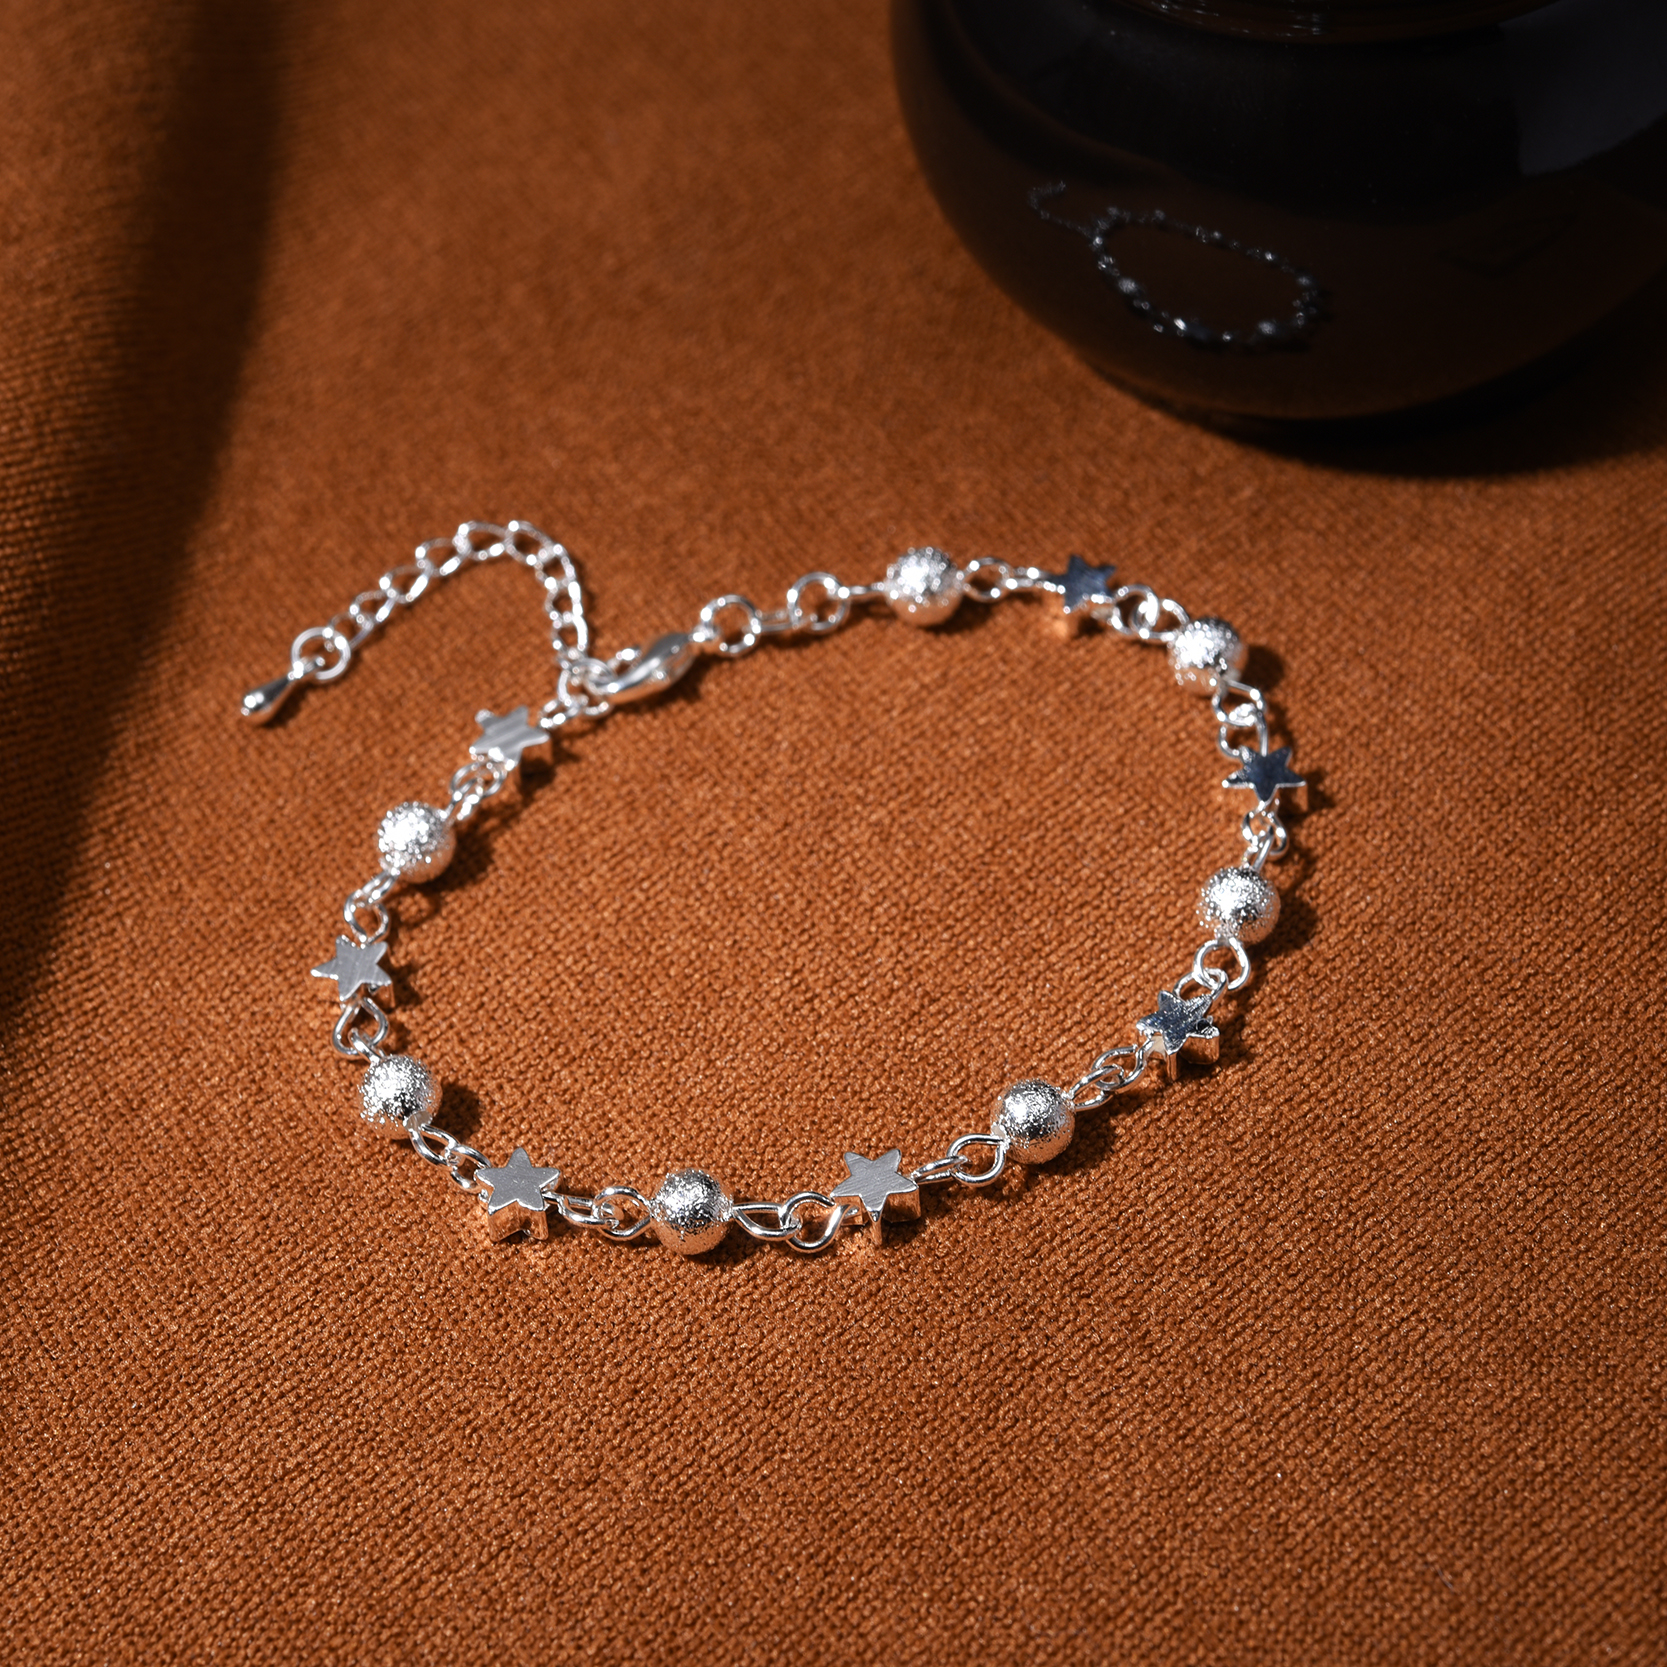 Silver Bracelet Women Summer Fashion Scrub Star Beads Bracelets Bangles Charm Jewelry Wedding Party Gift 2018 In From